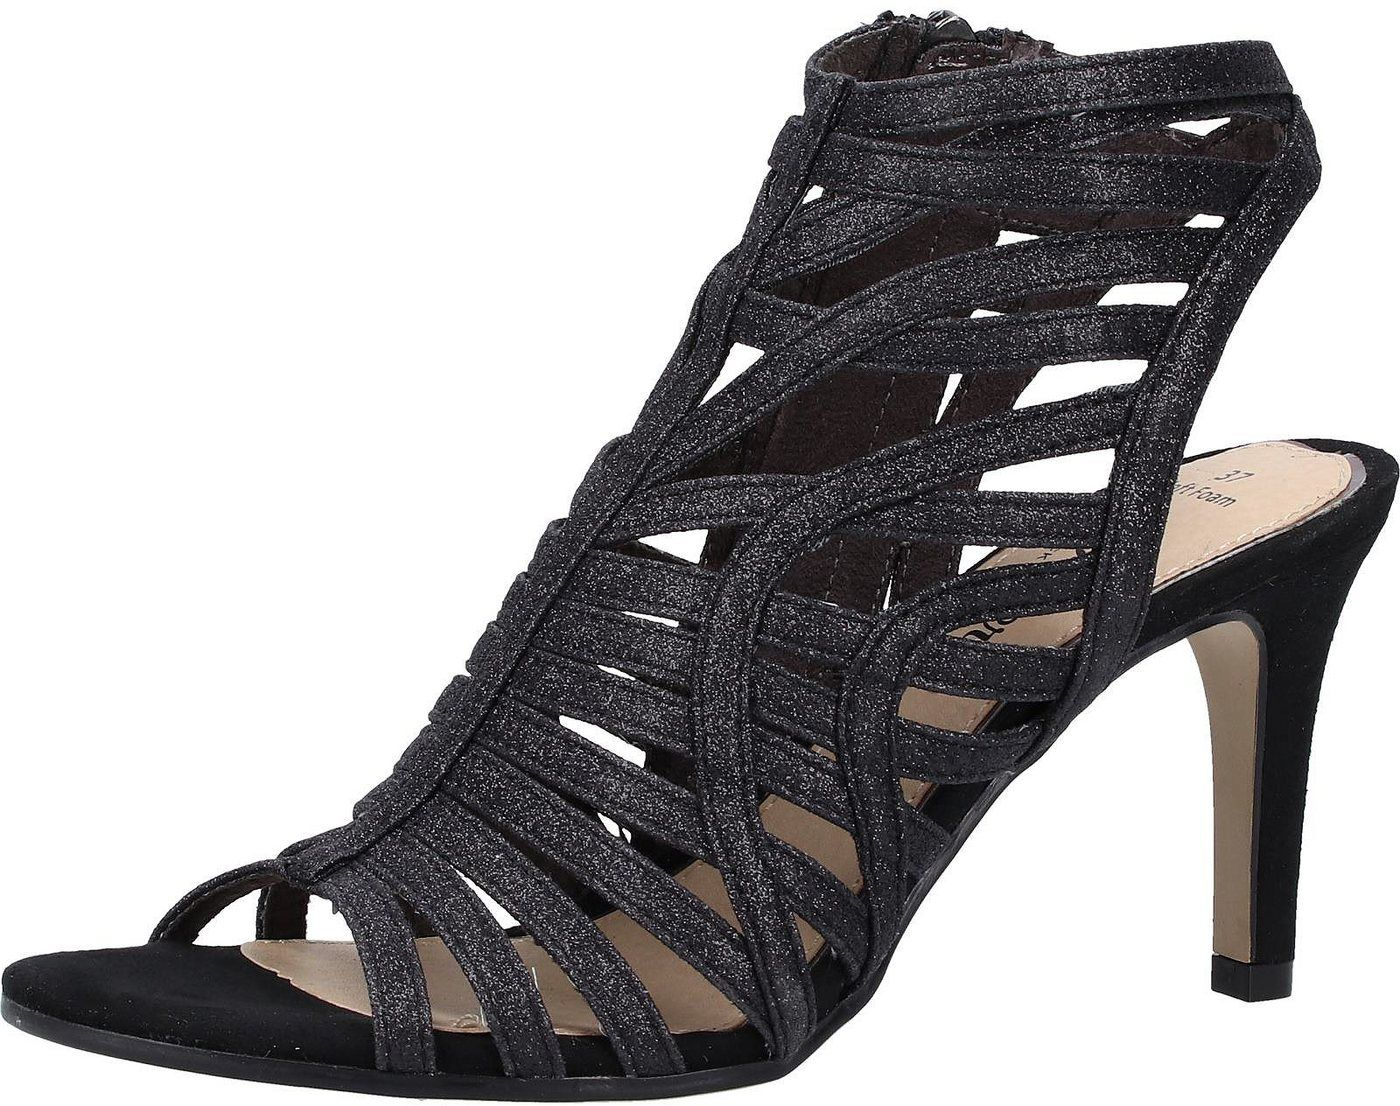 S Oliver Black Label Lederimitat High Heel Sandalette Heels High Heels Peep Toe